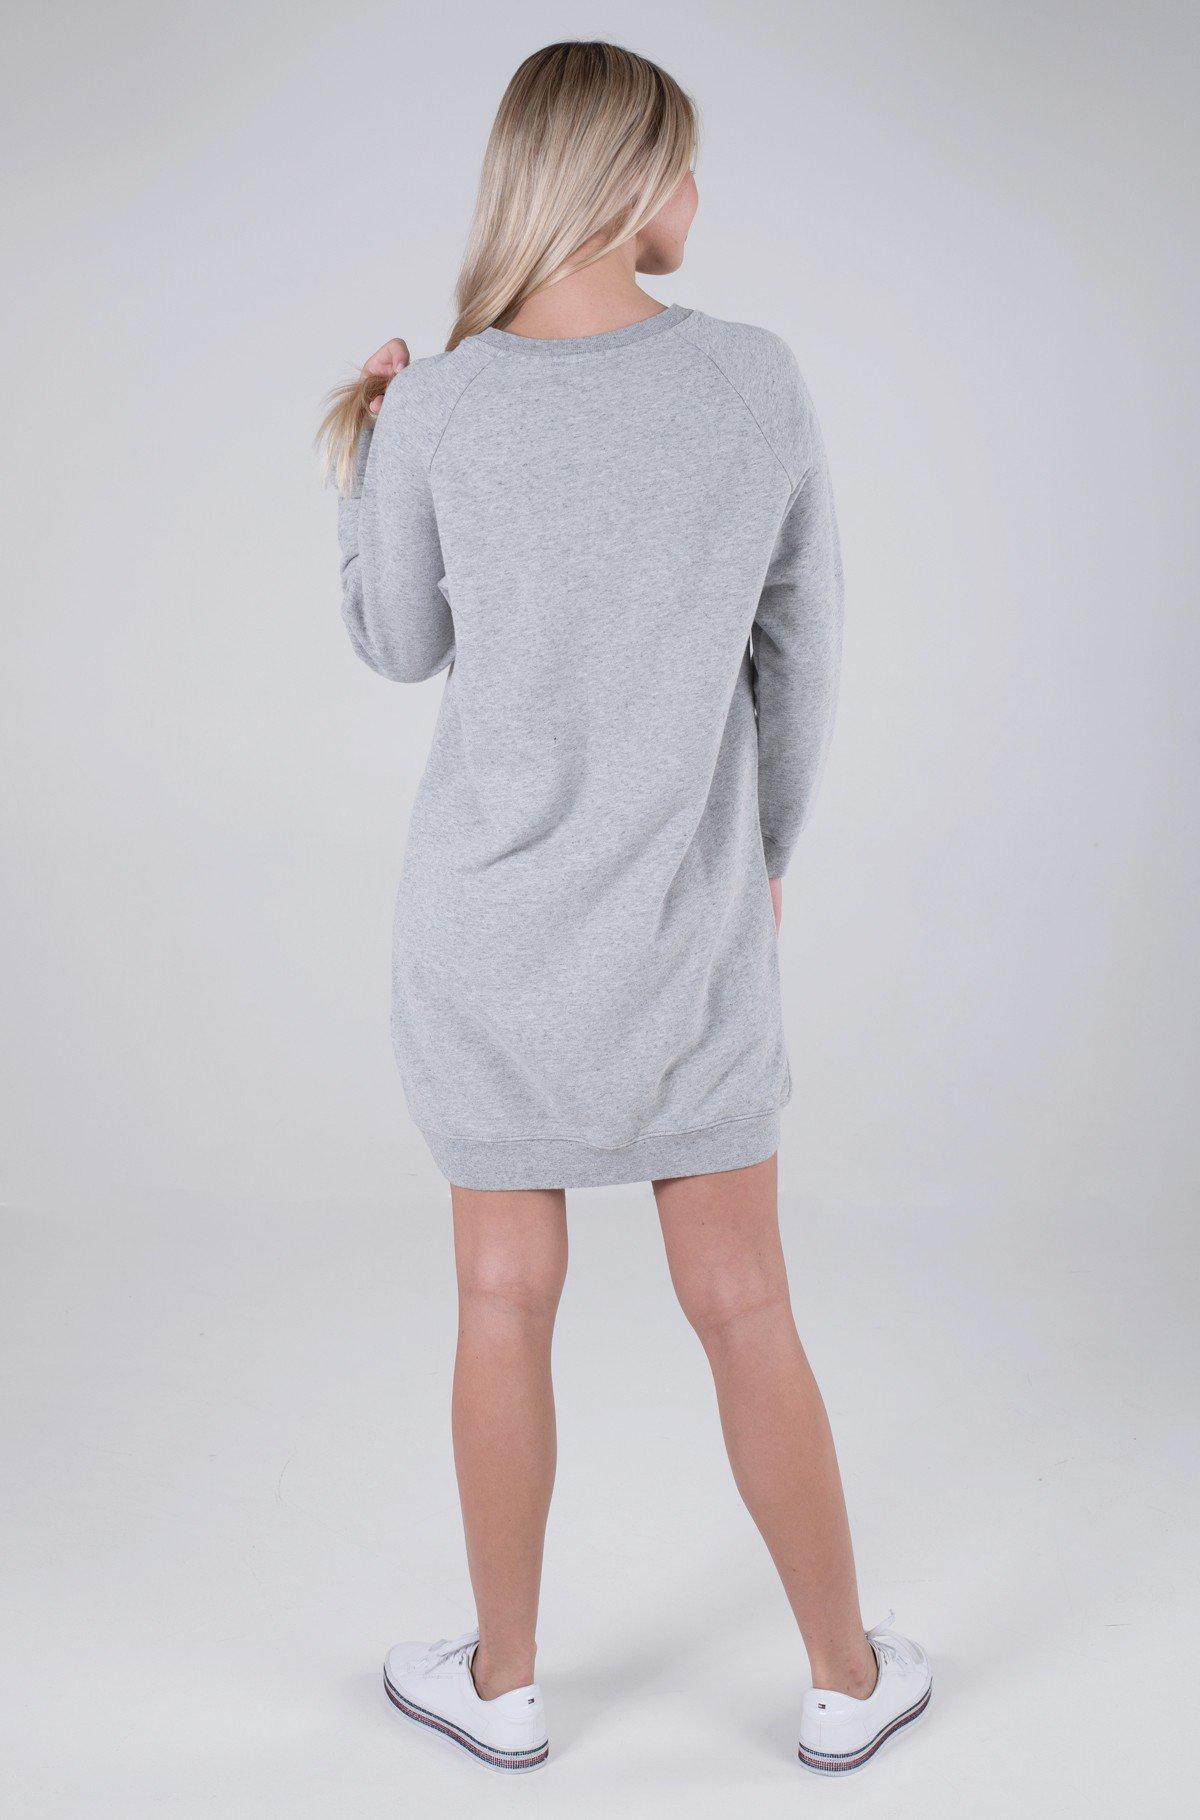 Sweatshirt dress 818600006-full-2